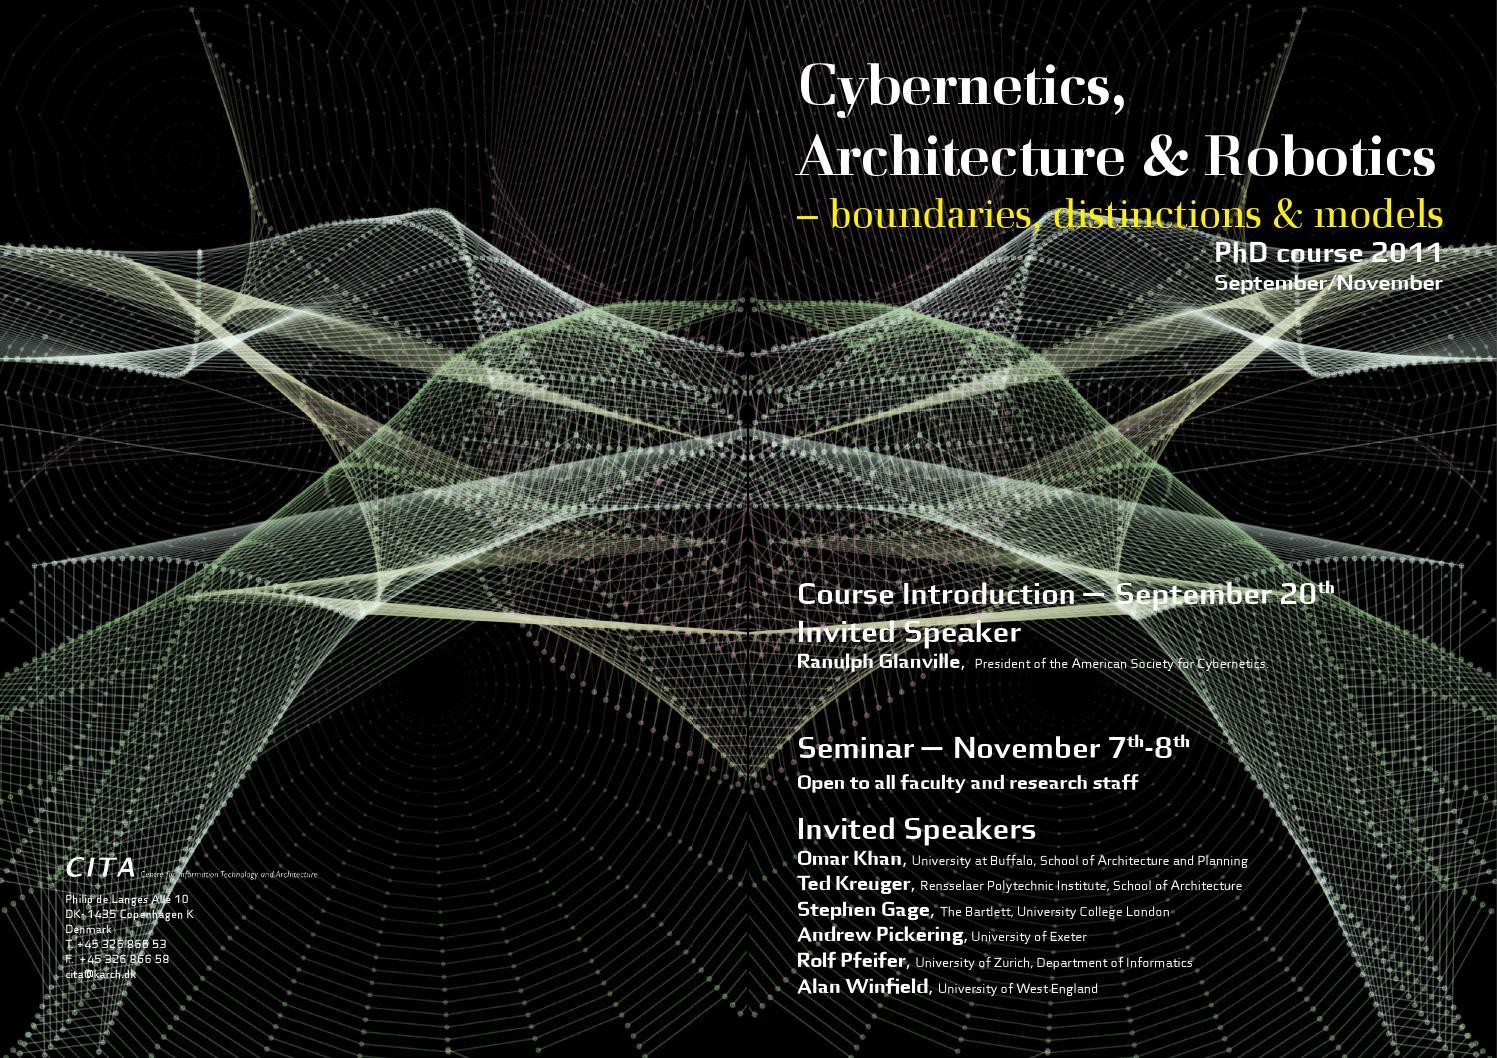 cybernetics and design glanville ranulph